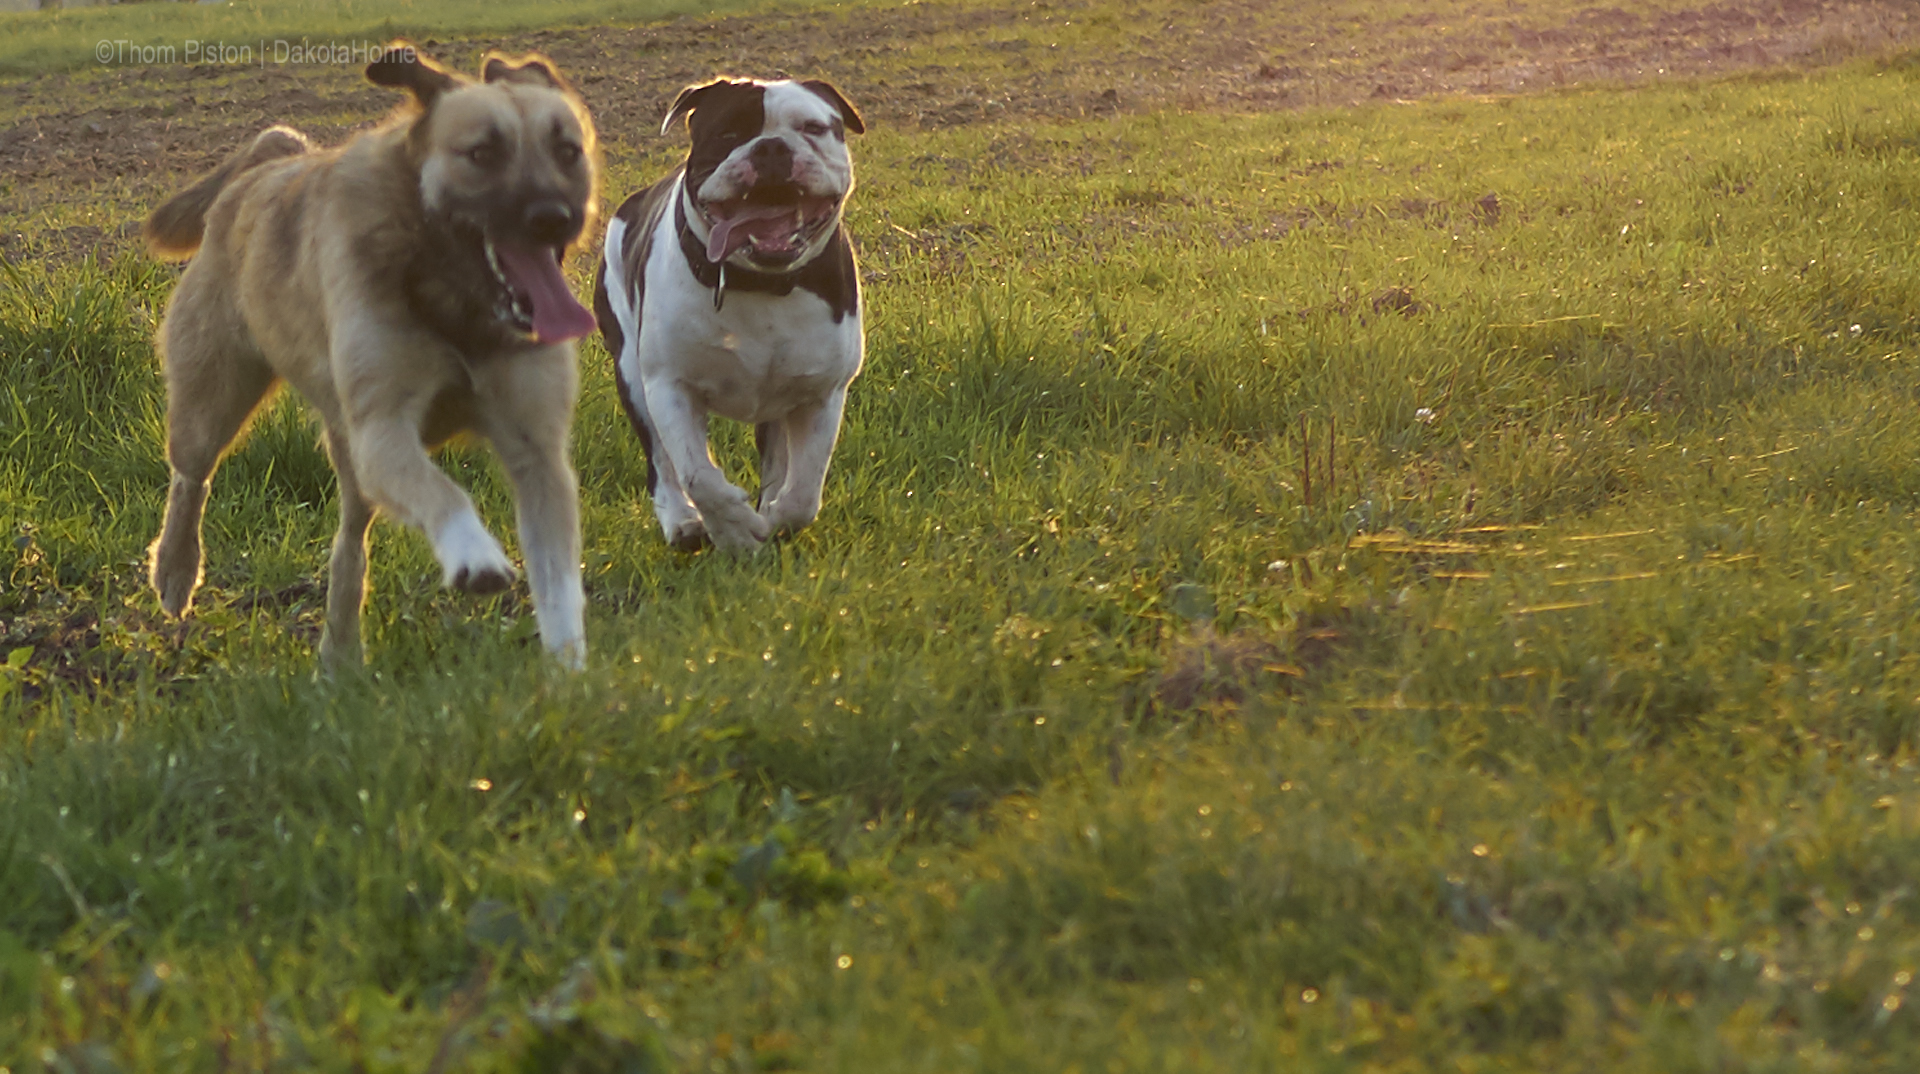 English Bulldog auf dem feld, olympus, olympusomd, wildlifephotographie, animalphoto,